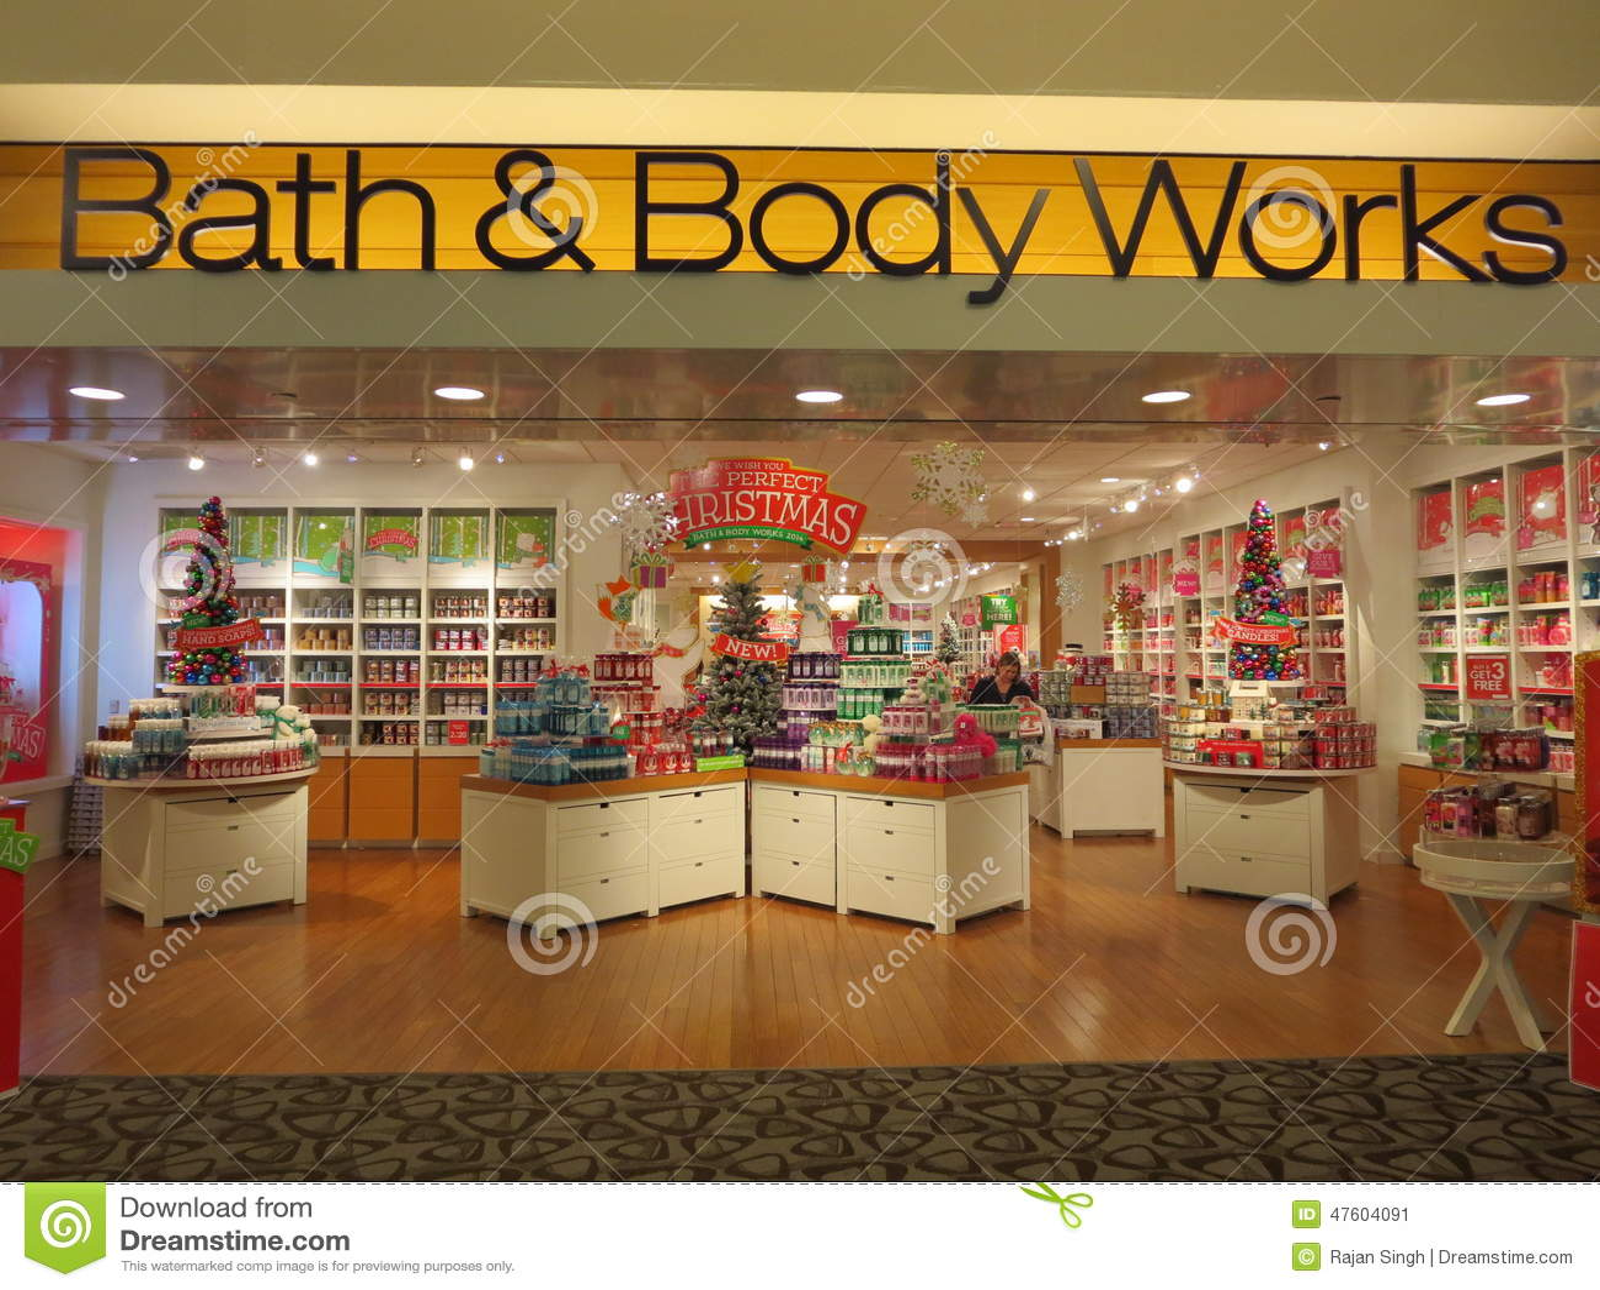 bath and body works utah - Mersn.proforum.co